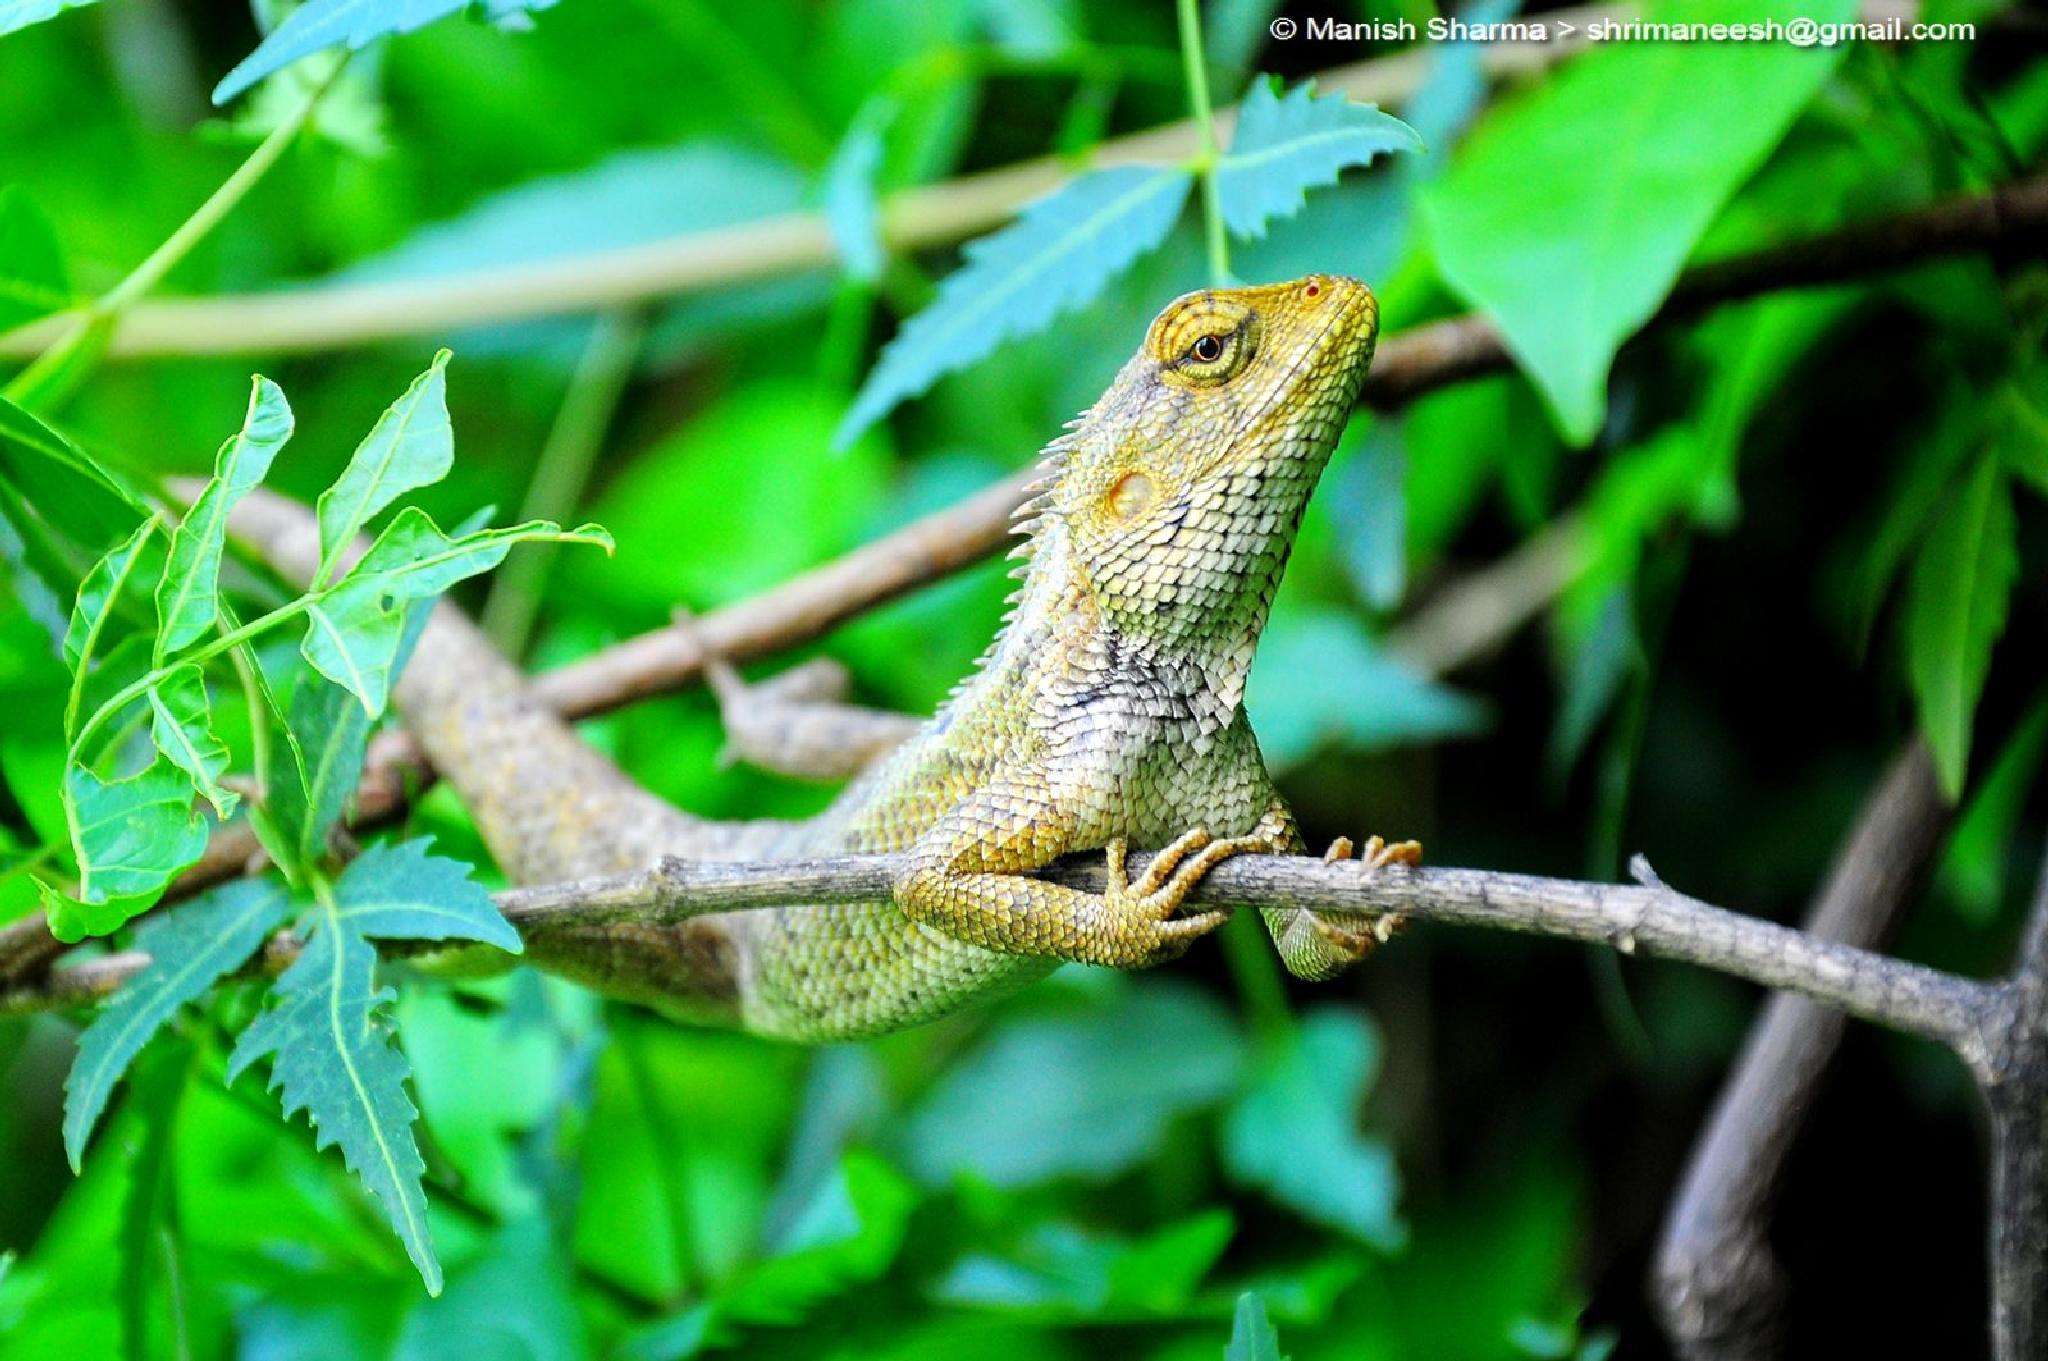 Oriental Garden Lizard by Maneesh Sharma